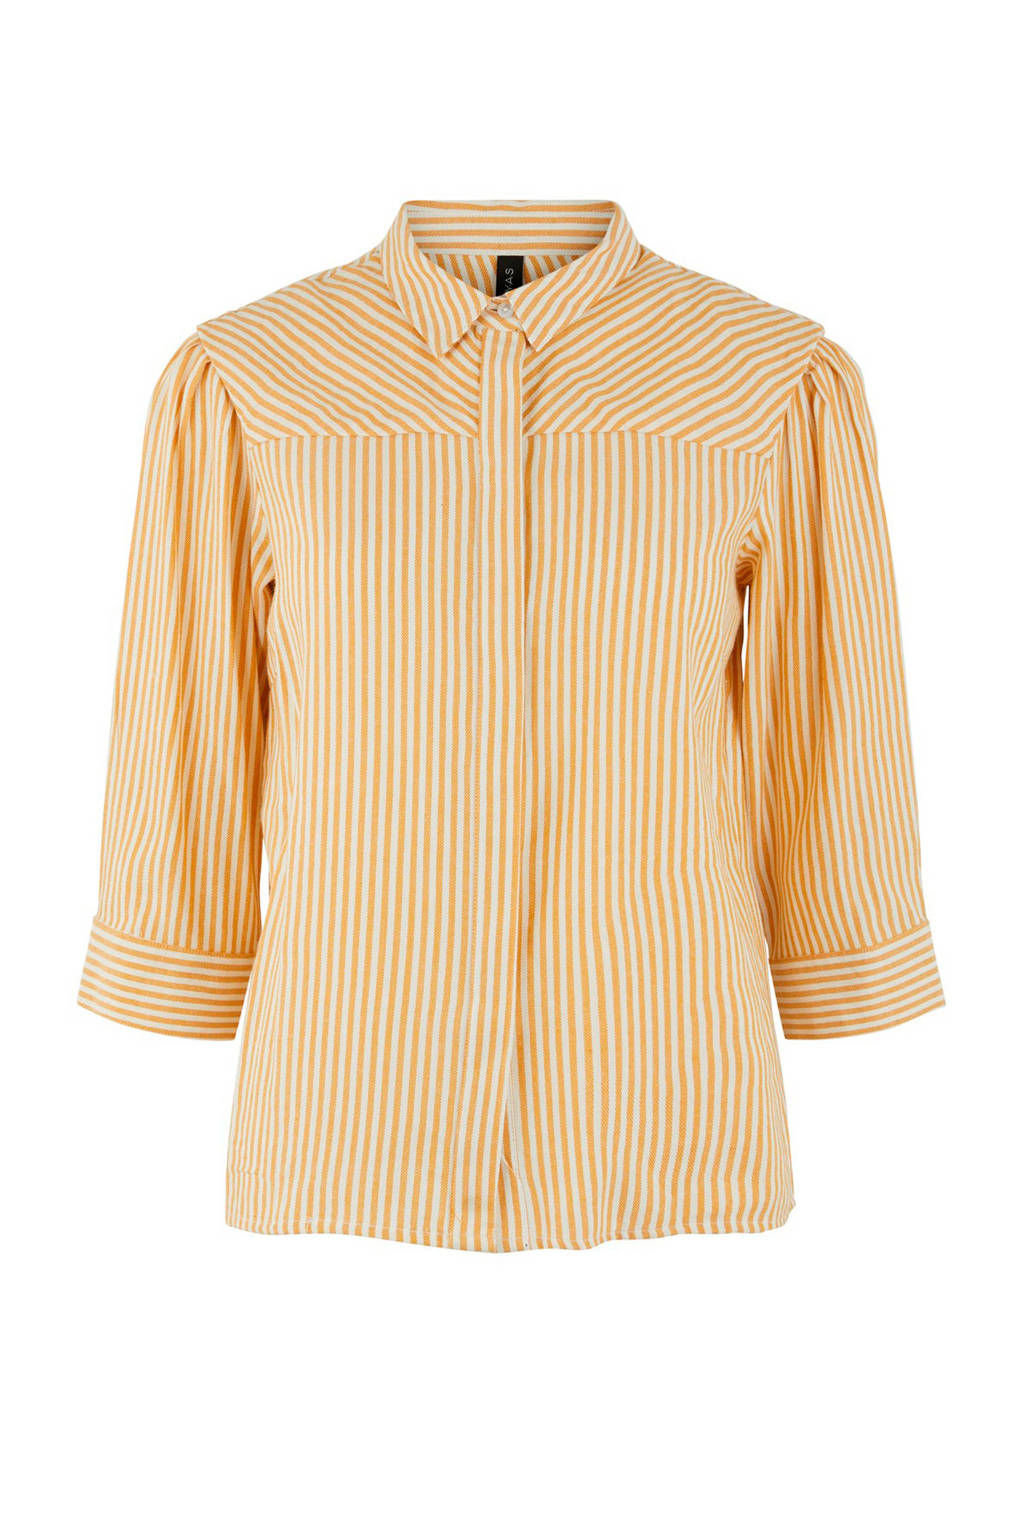 Y.A.S blouse gestreept, Geel/wit